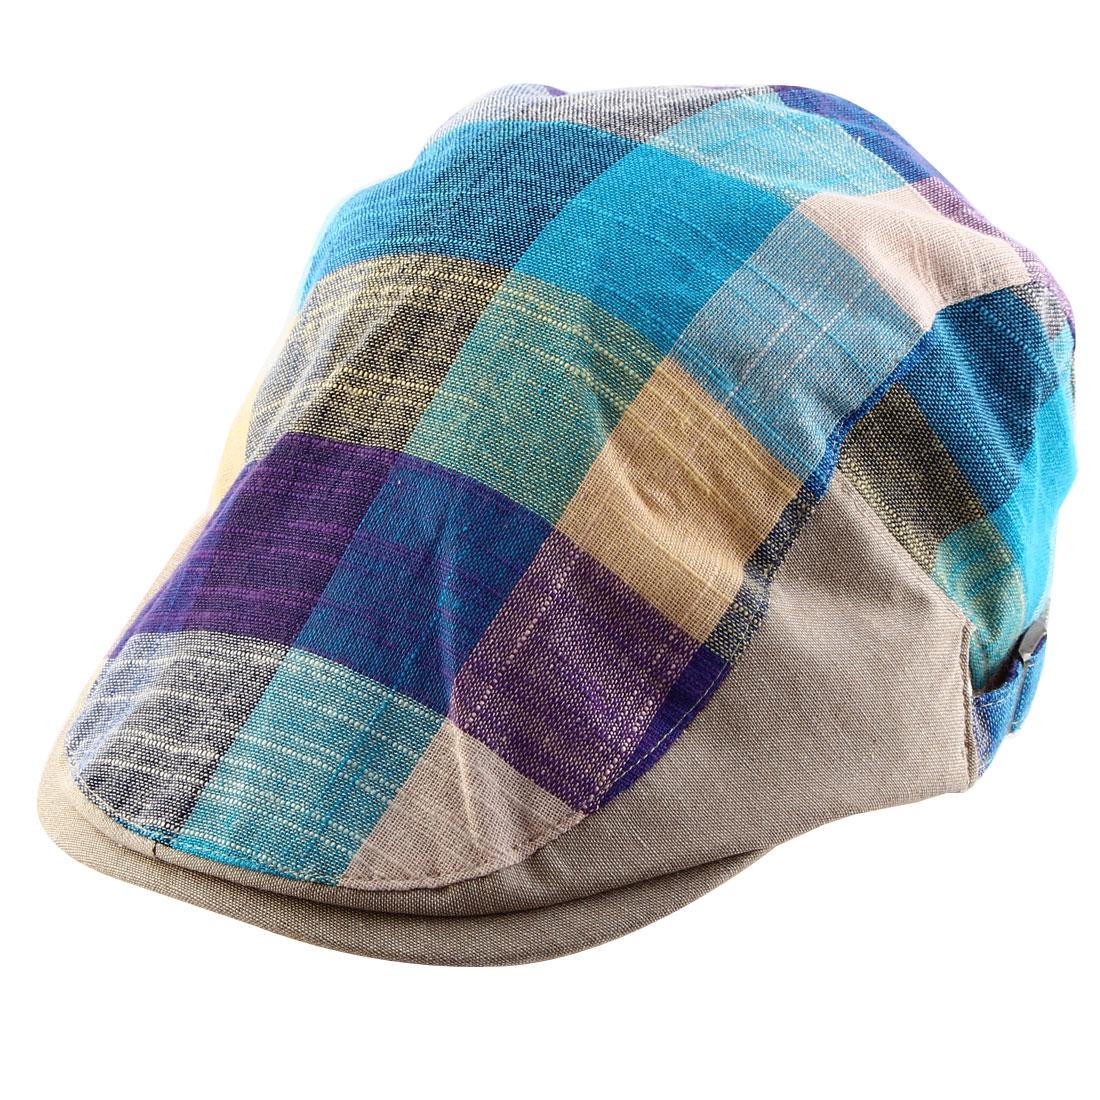 Men Women Plaid Pattern Newsboy Ivy Cap Driving Casual Flat Beret Hat Tricolor